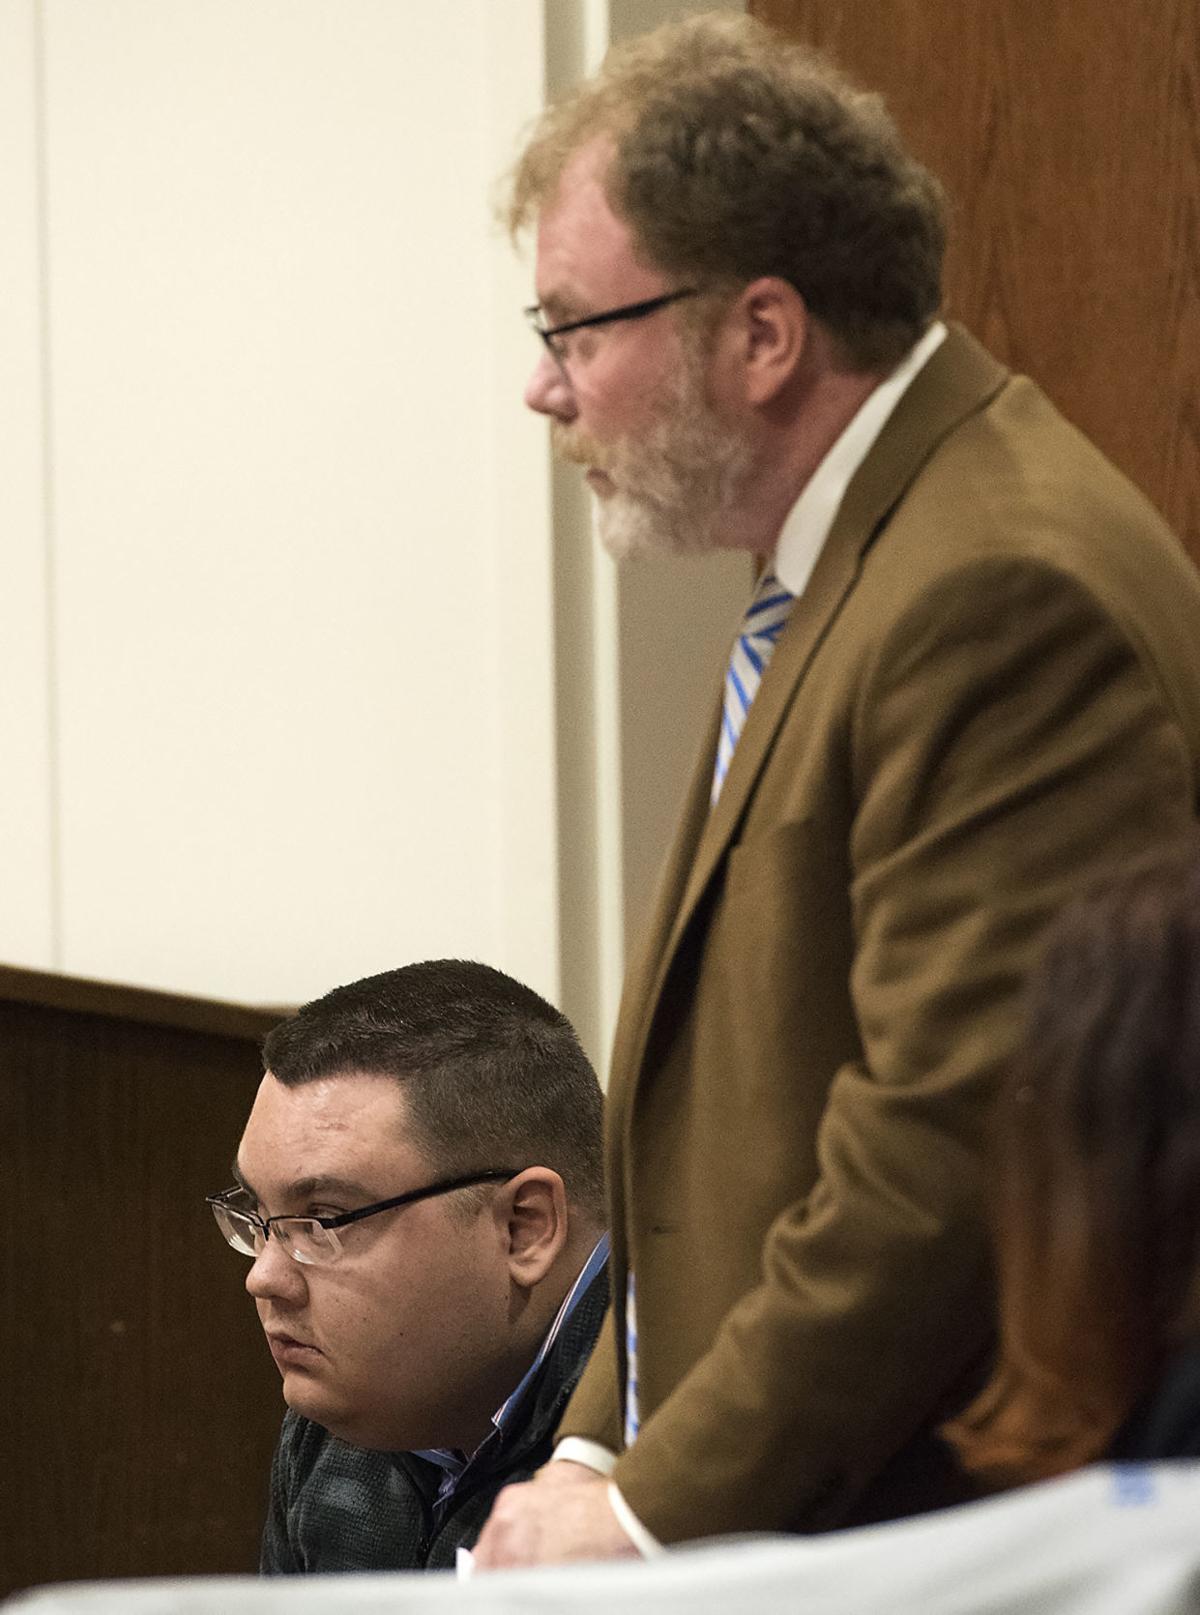 Cody Riddle sentencing